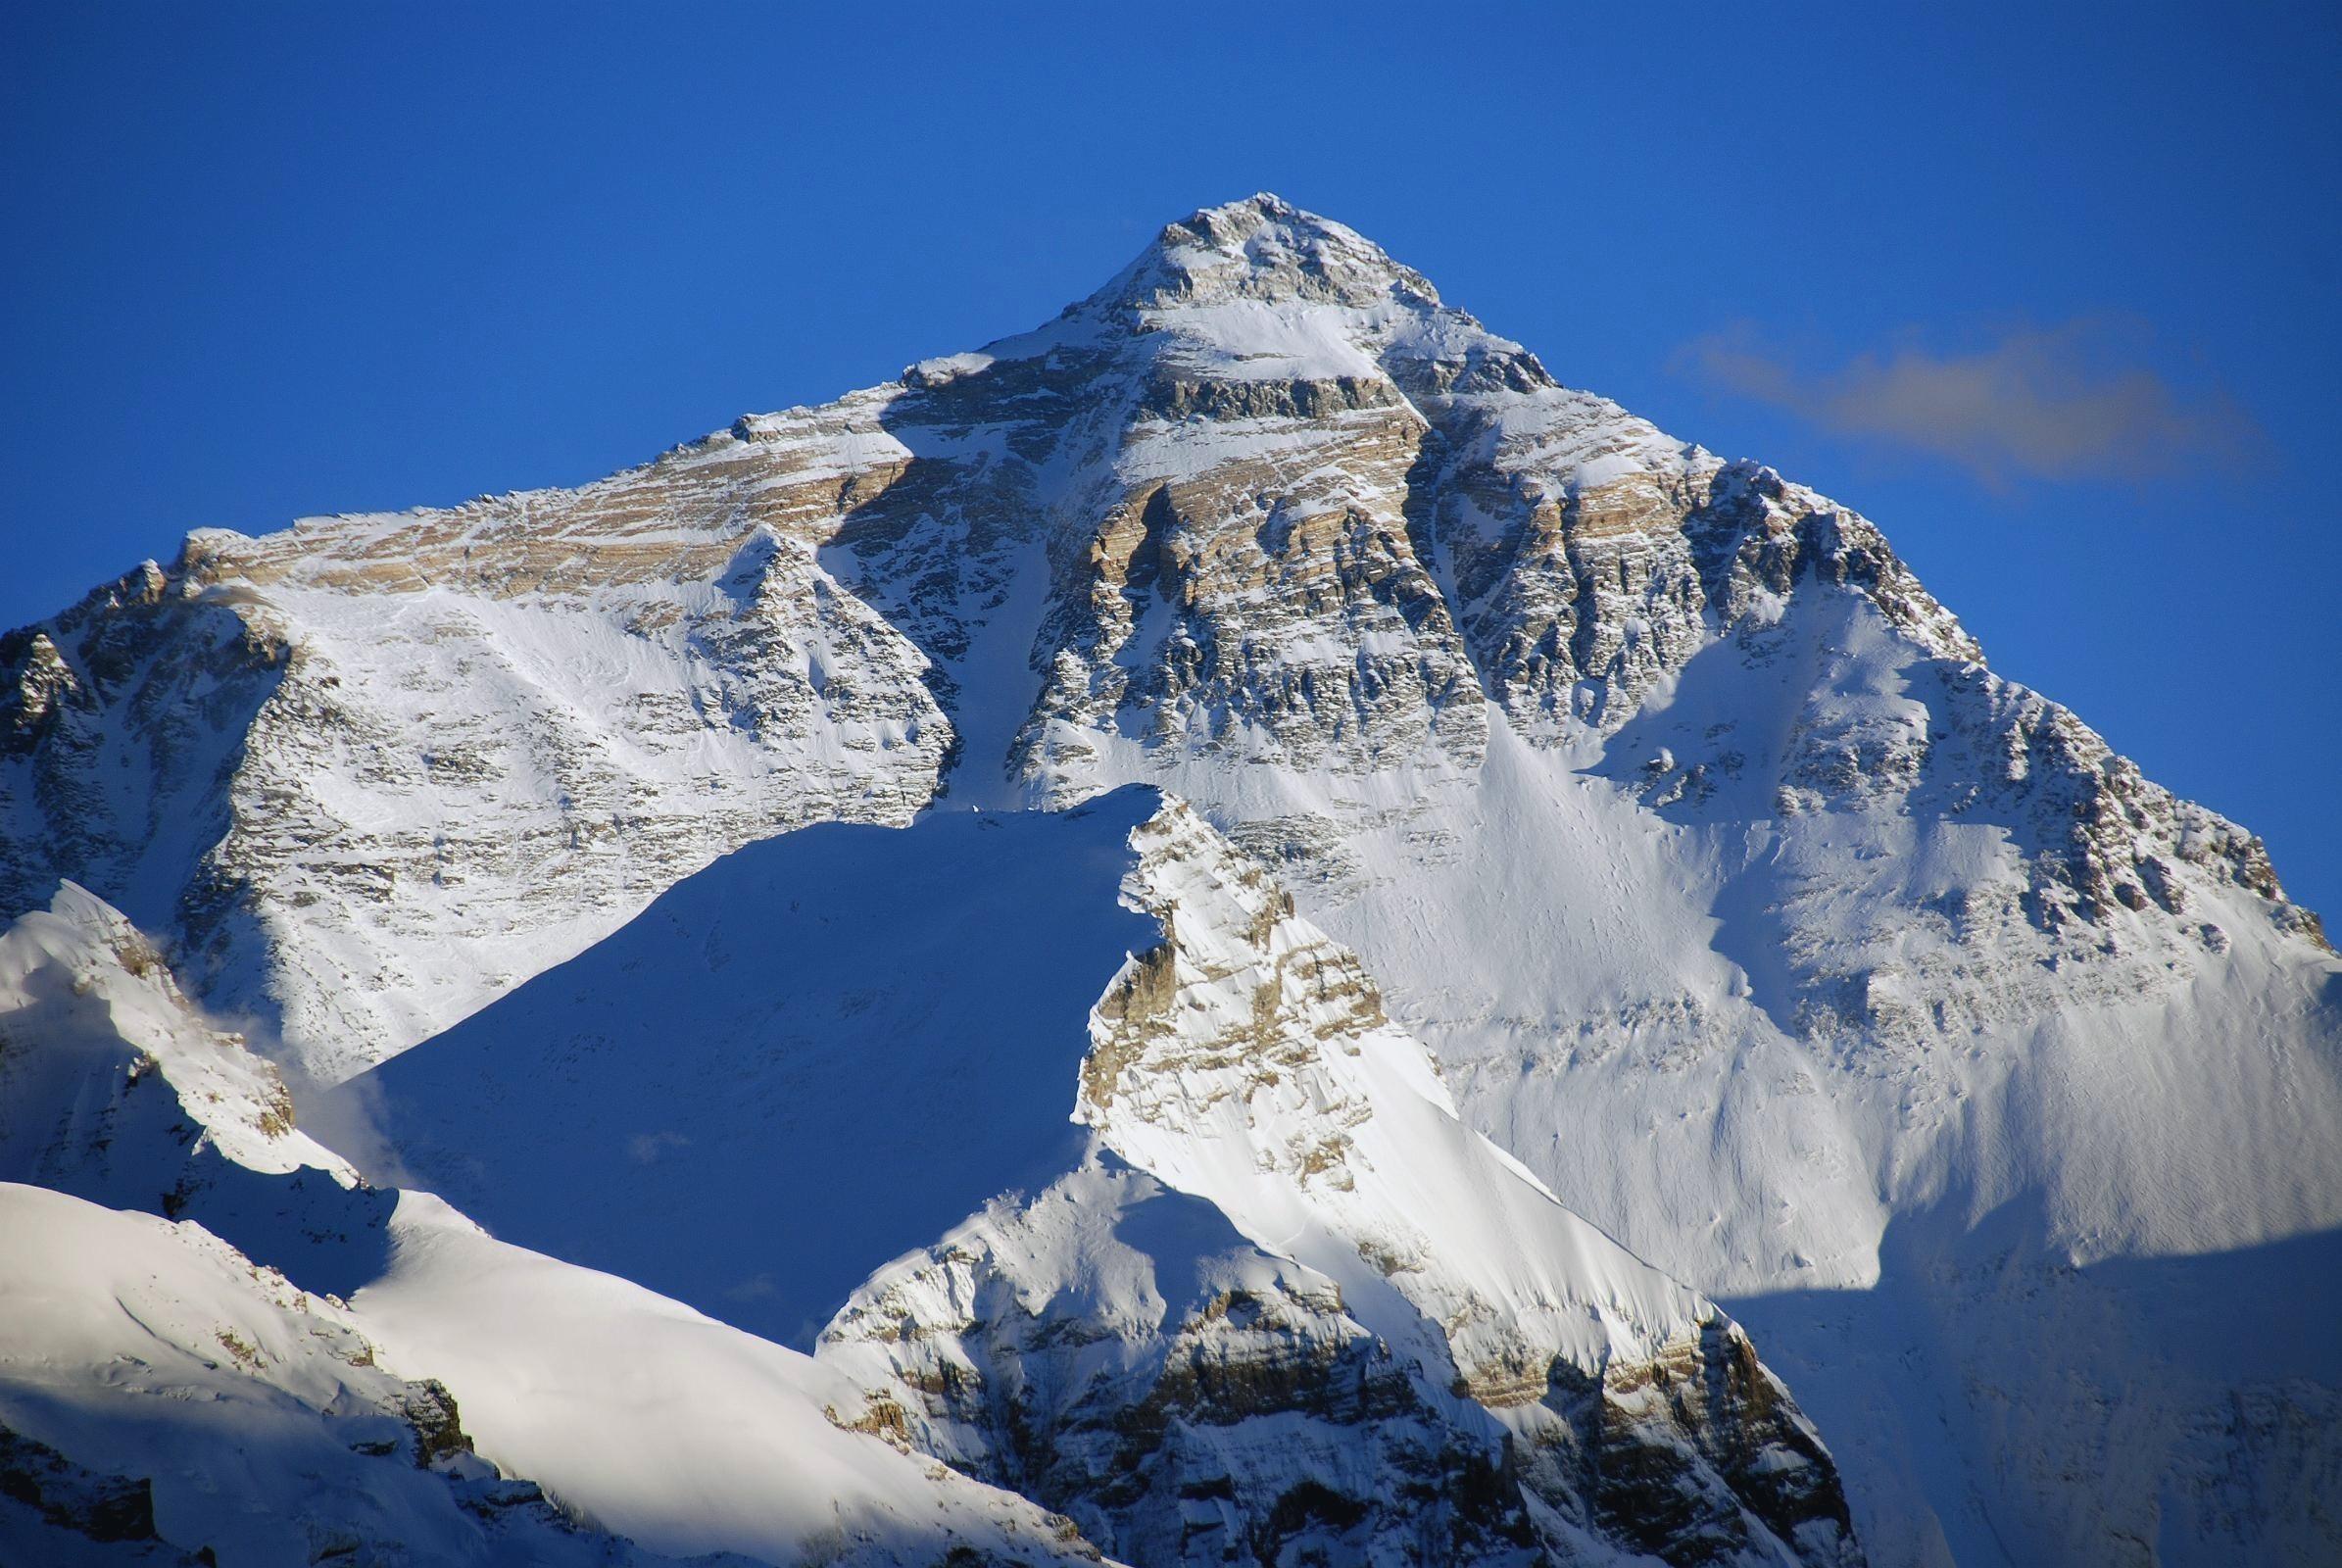 Mount Everest Snowy Peak Landscape Takayama Nepal Tibet 2390x1600